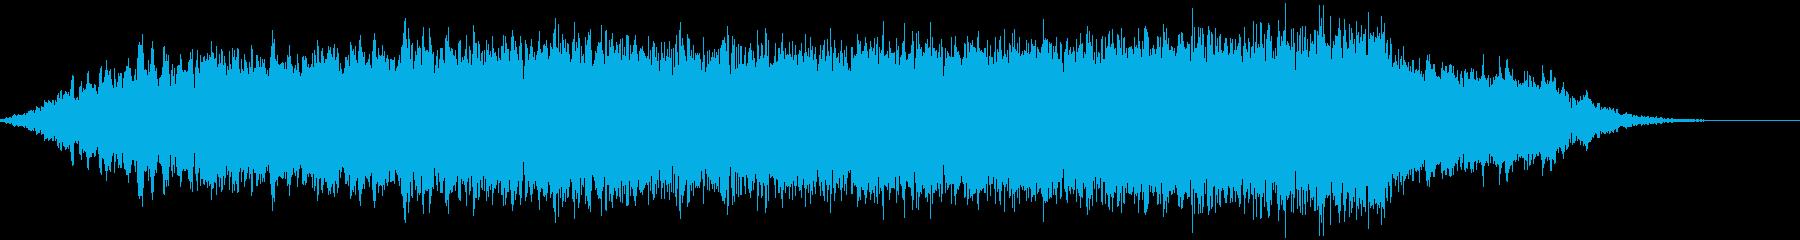 CINEMATIC RISER_39の再生済みの波形